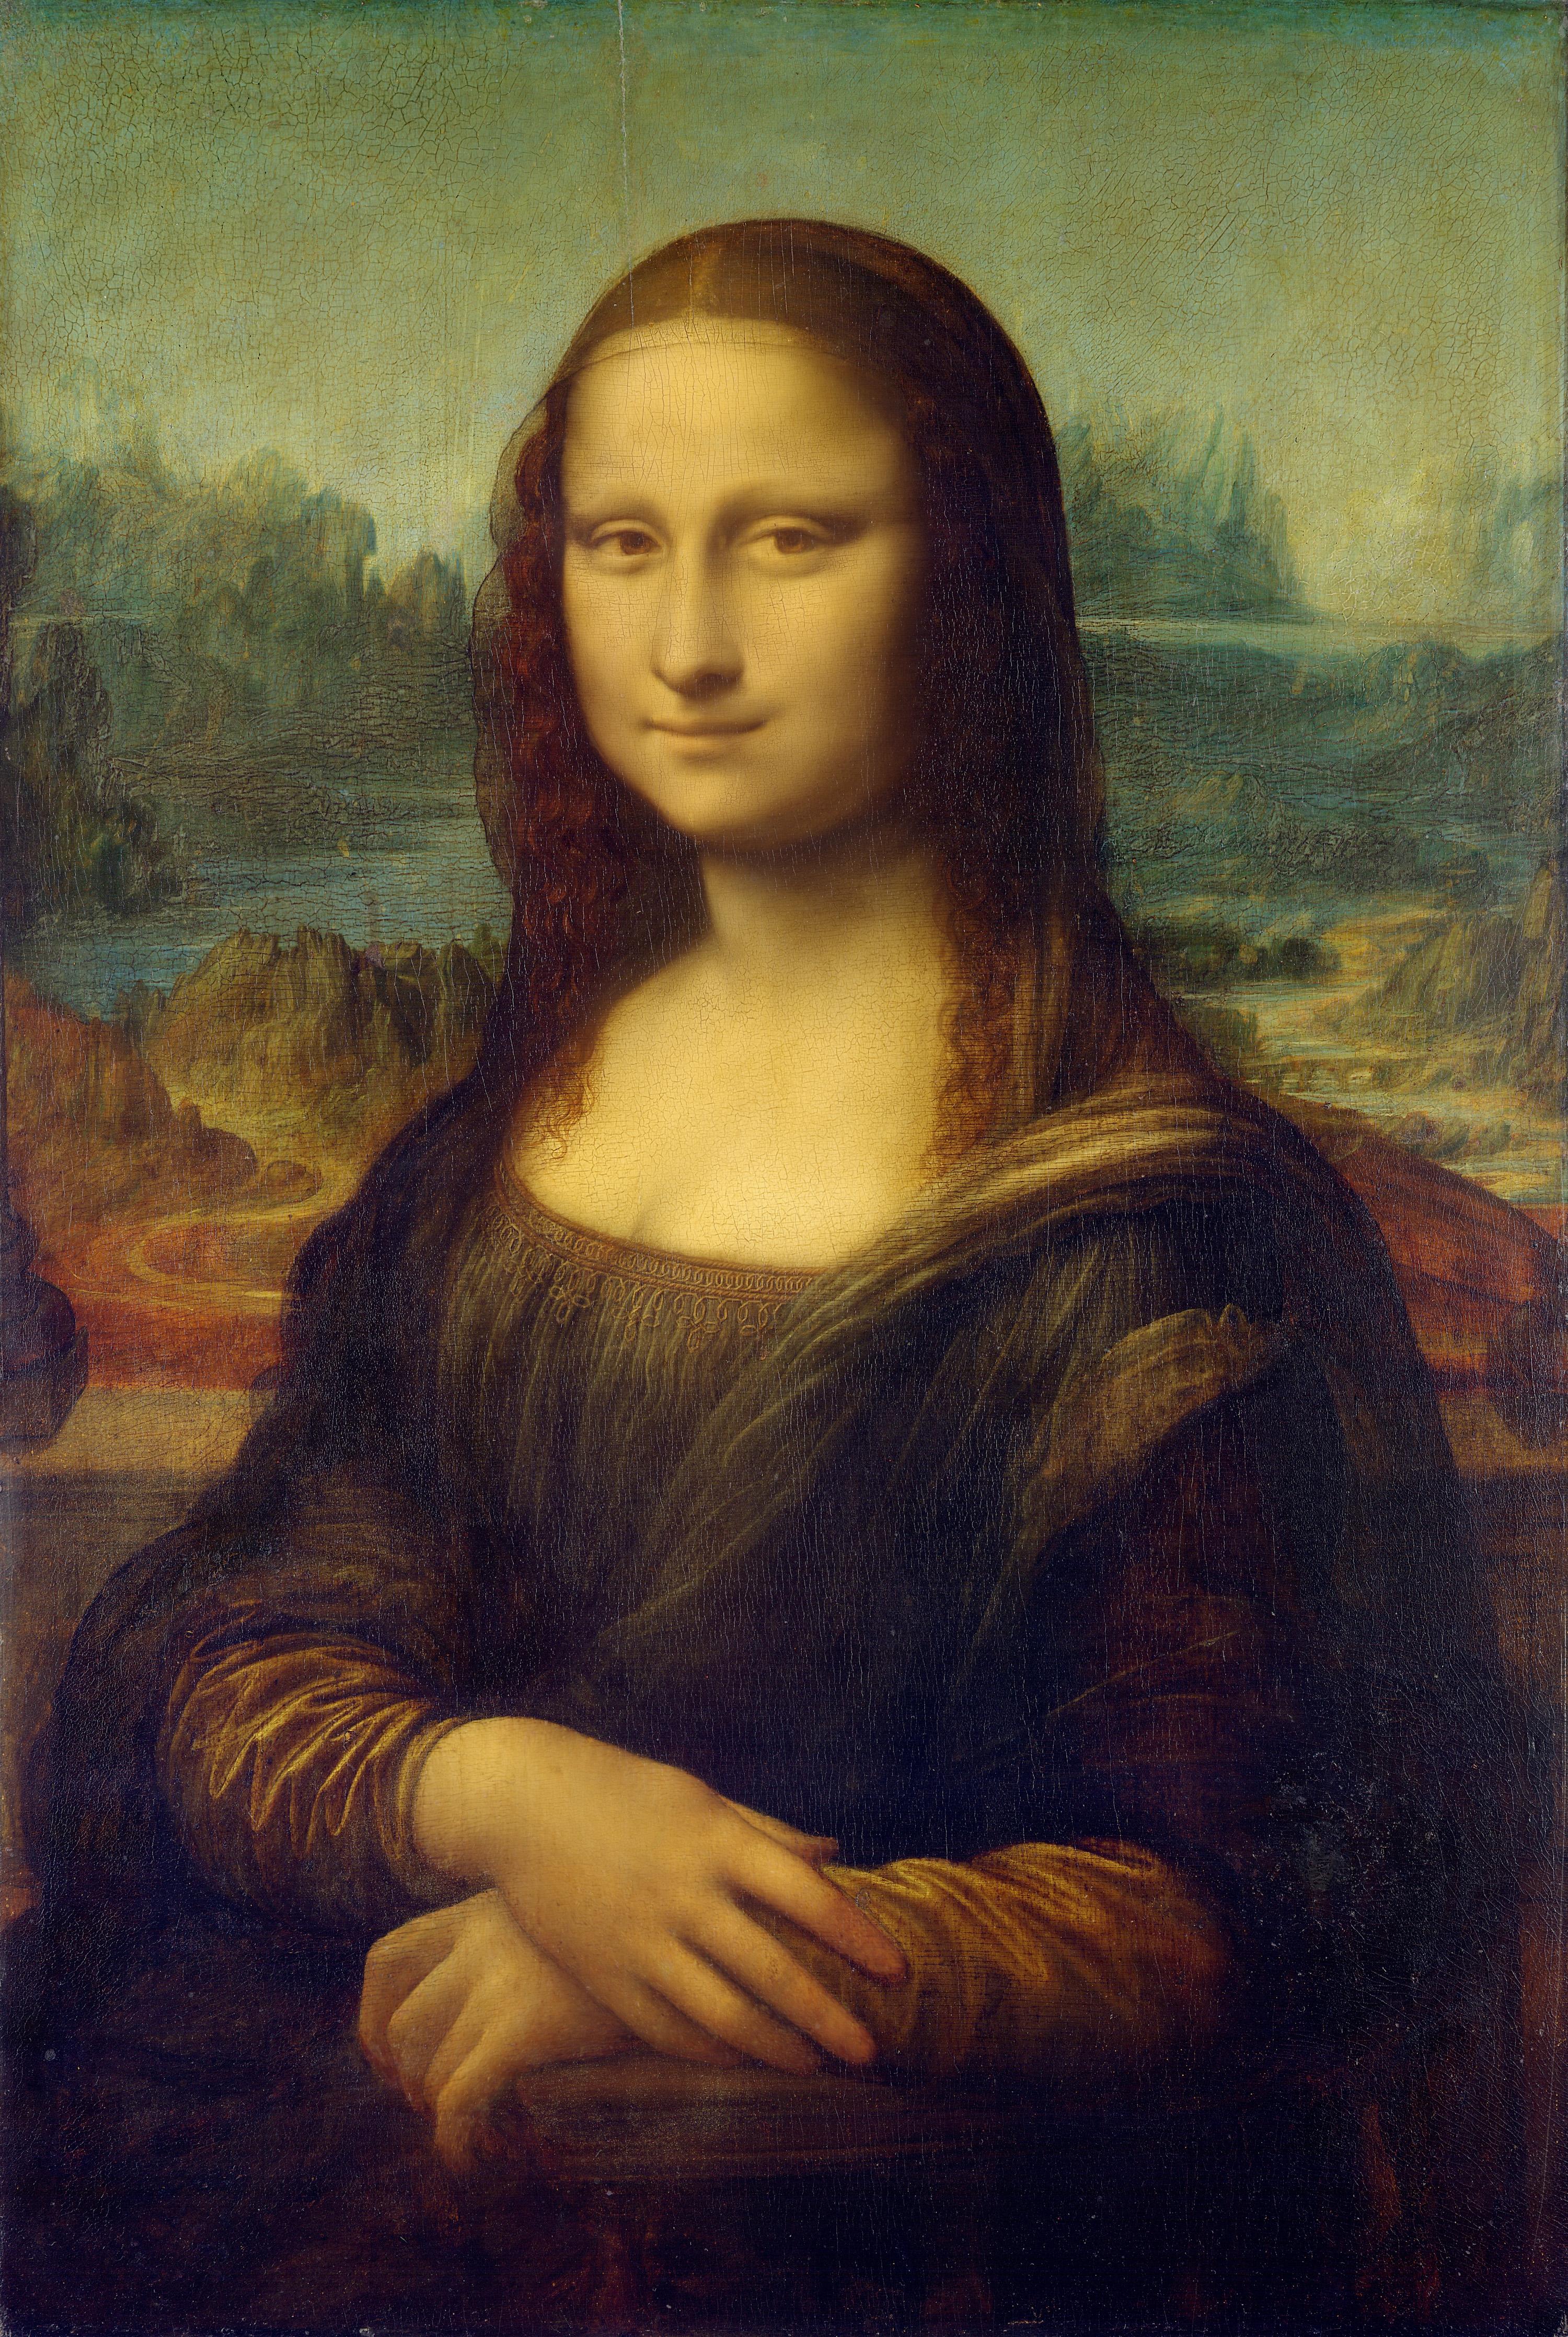 Mona Lisa, by Leonardo da Vinci, from C2RMF Repaired.jpg